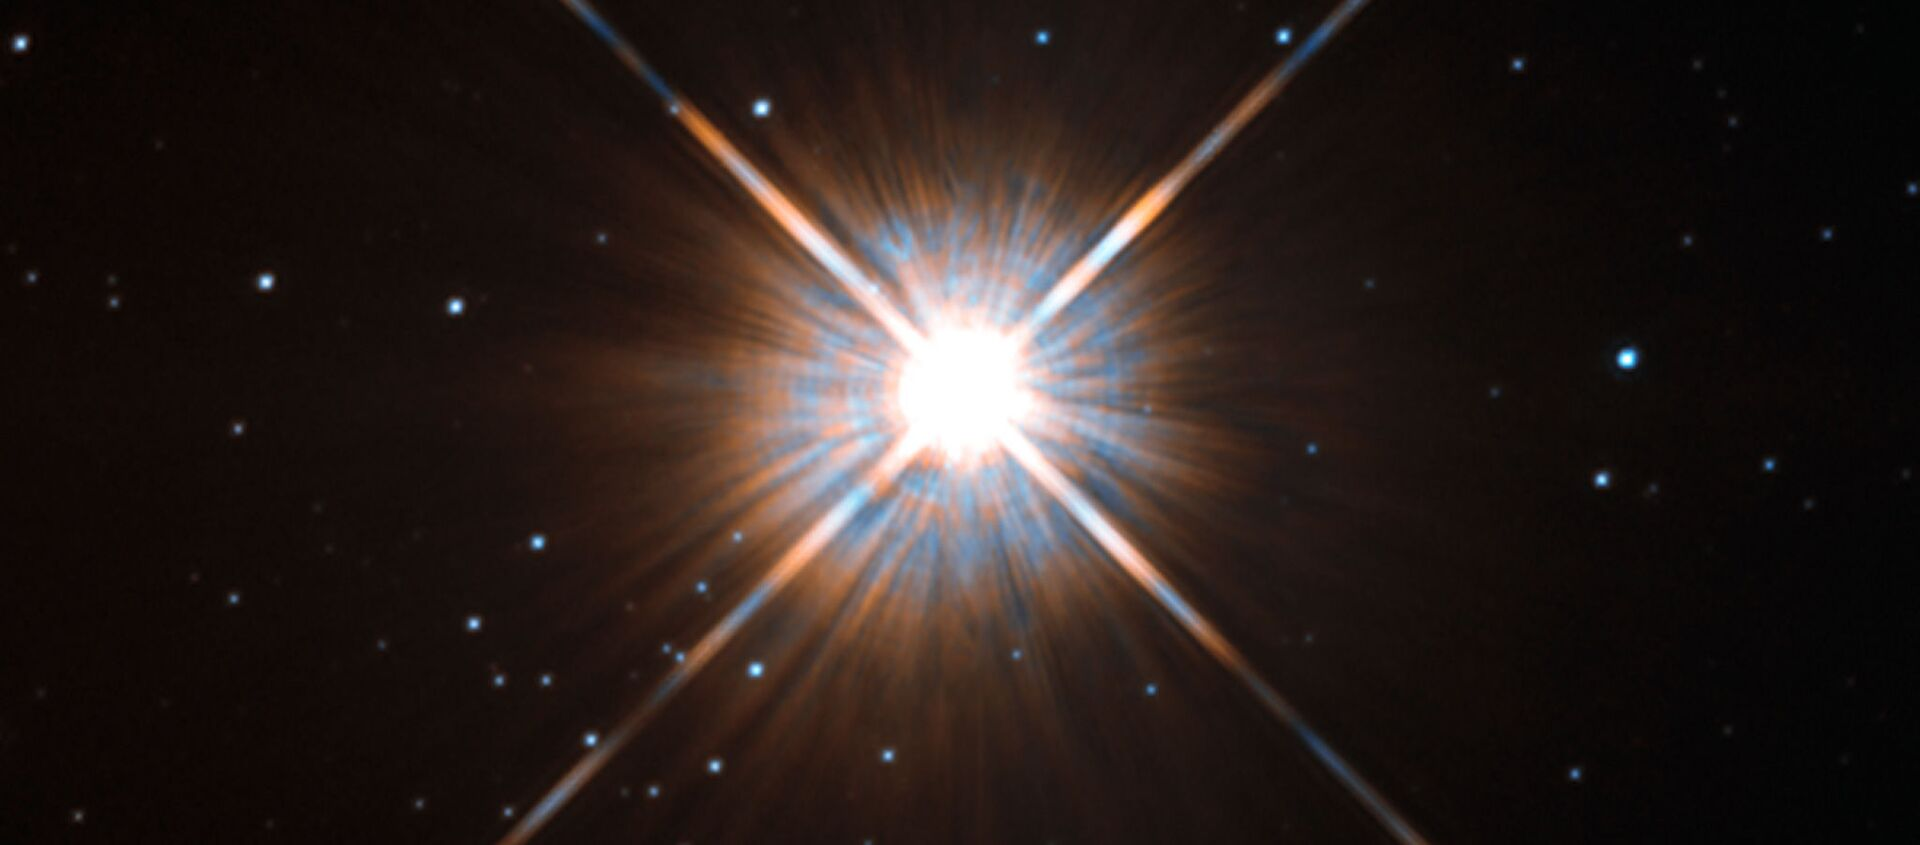 La estrella Próxima Centauri - Sputnik Mundo, 1920, 19.12.2020